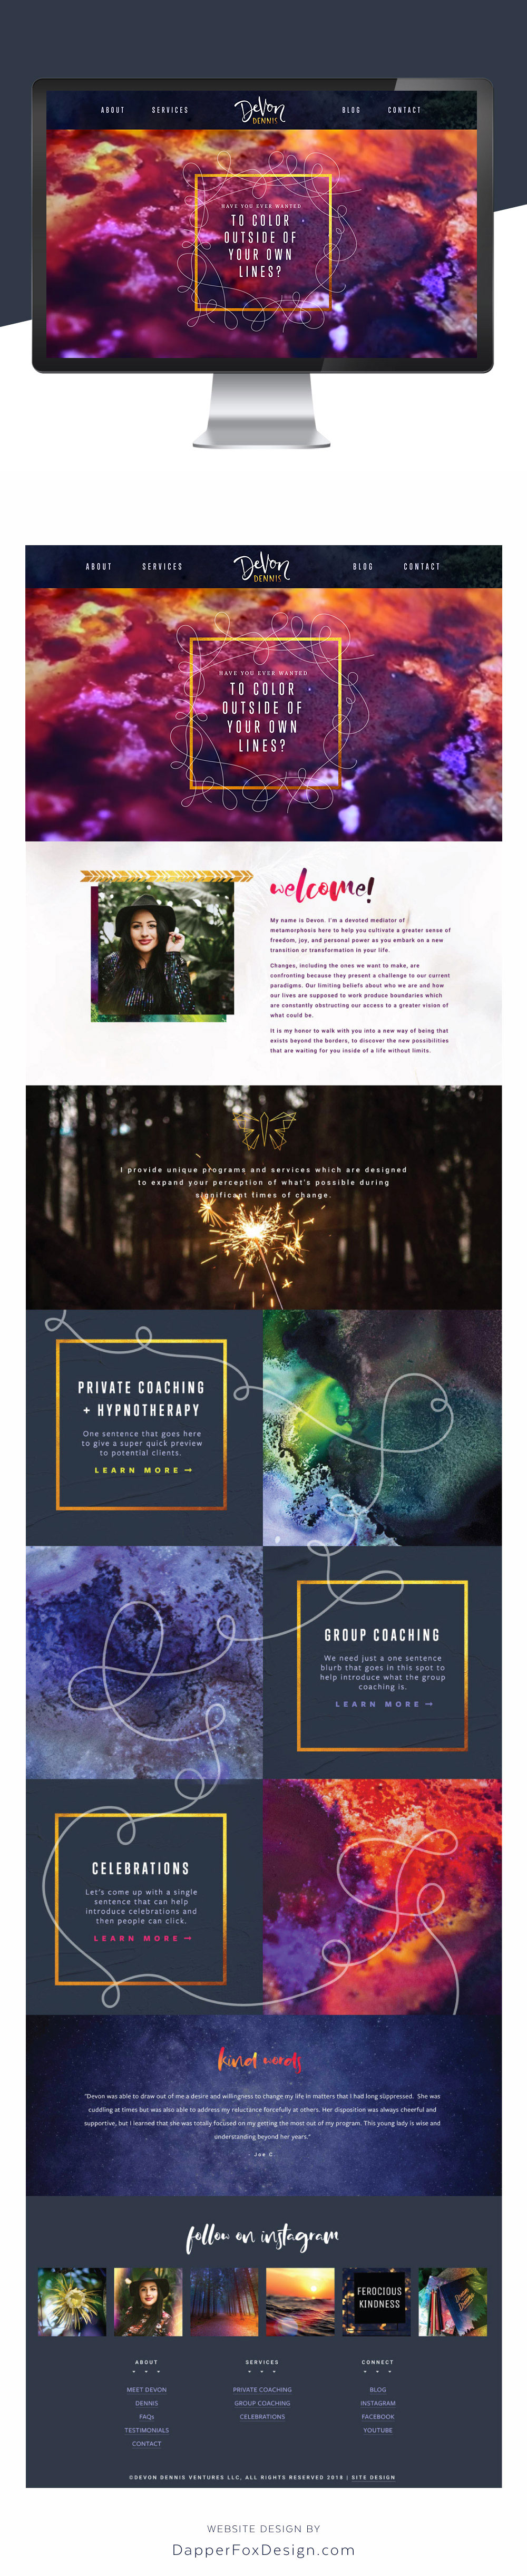 Squarespace Website Design Magical Brand for Coaching Watercolor Textures Handwritten Script Font #websitedesign #modernwebsite #magicalwebsitedesign